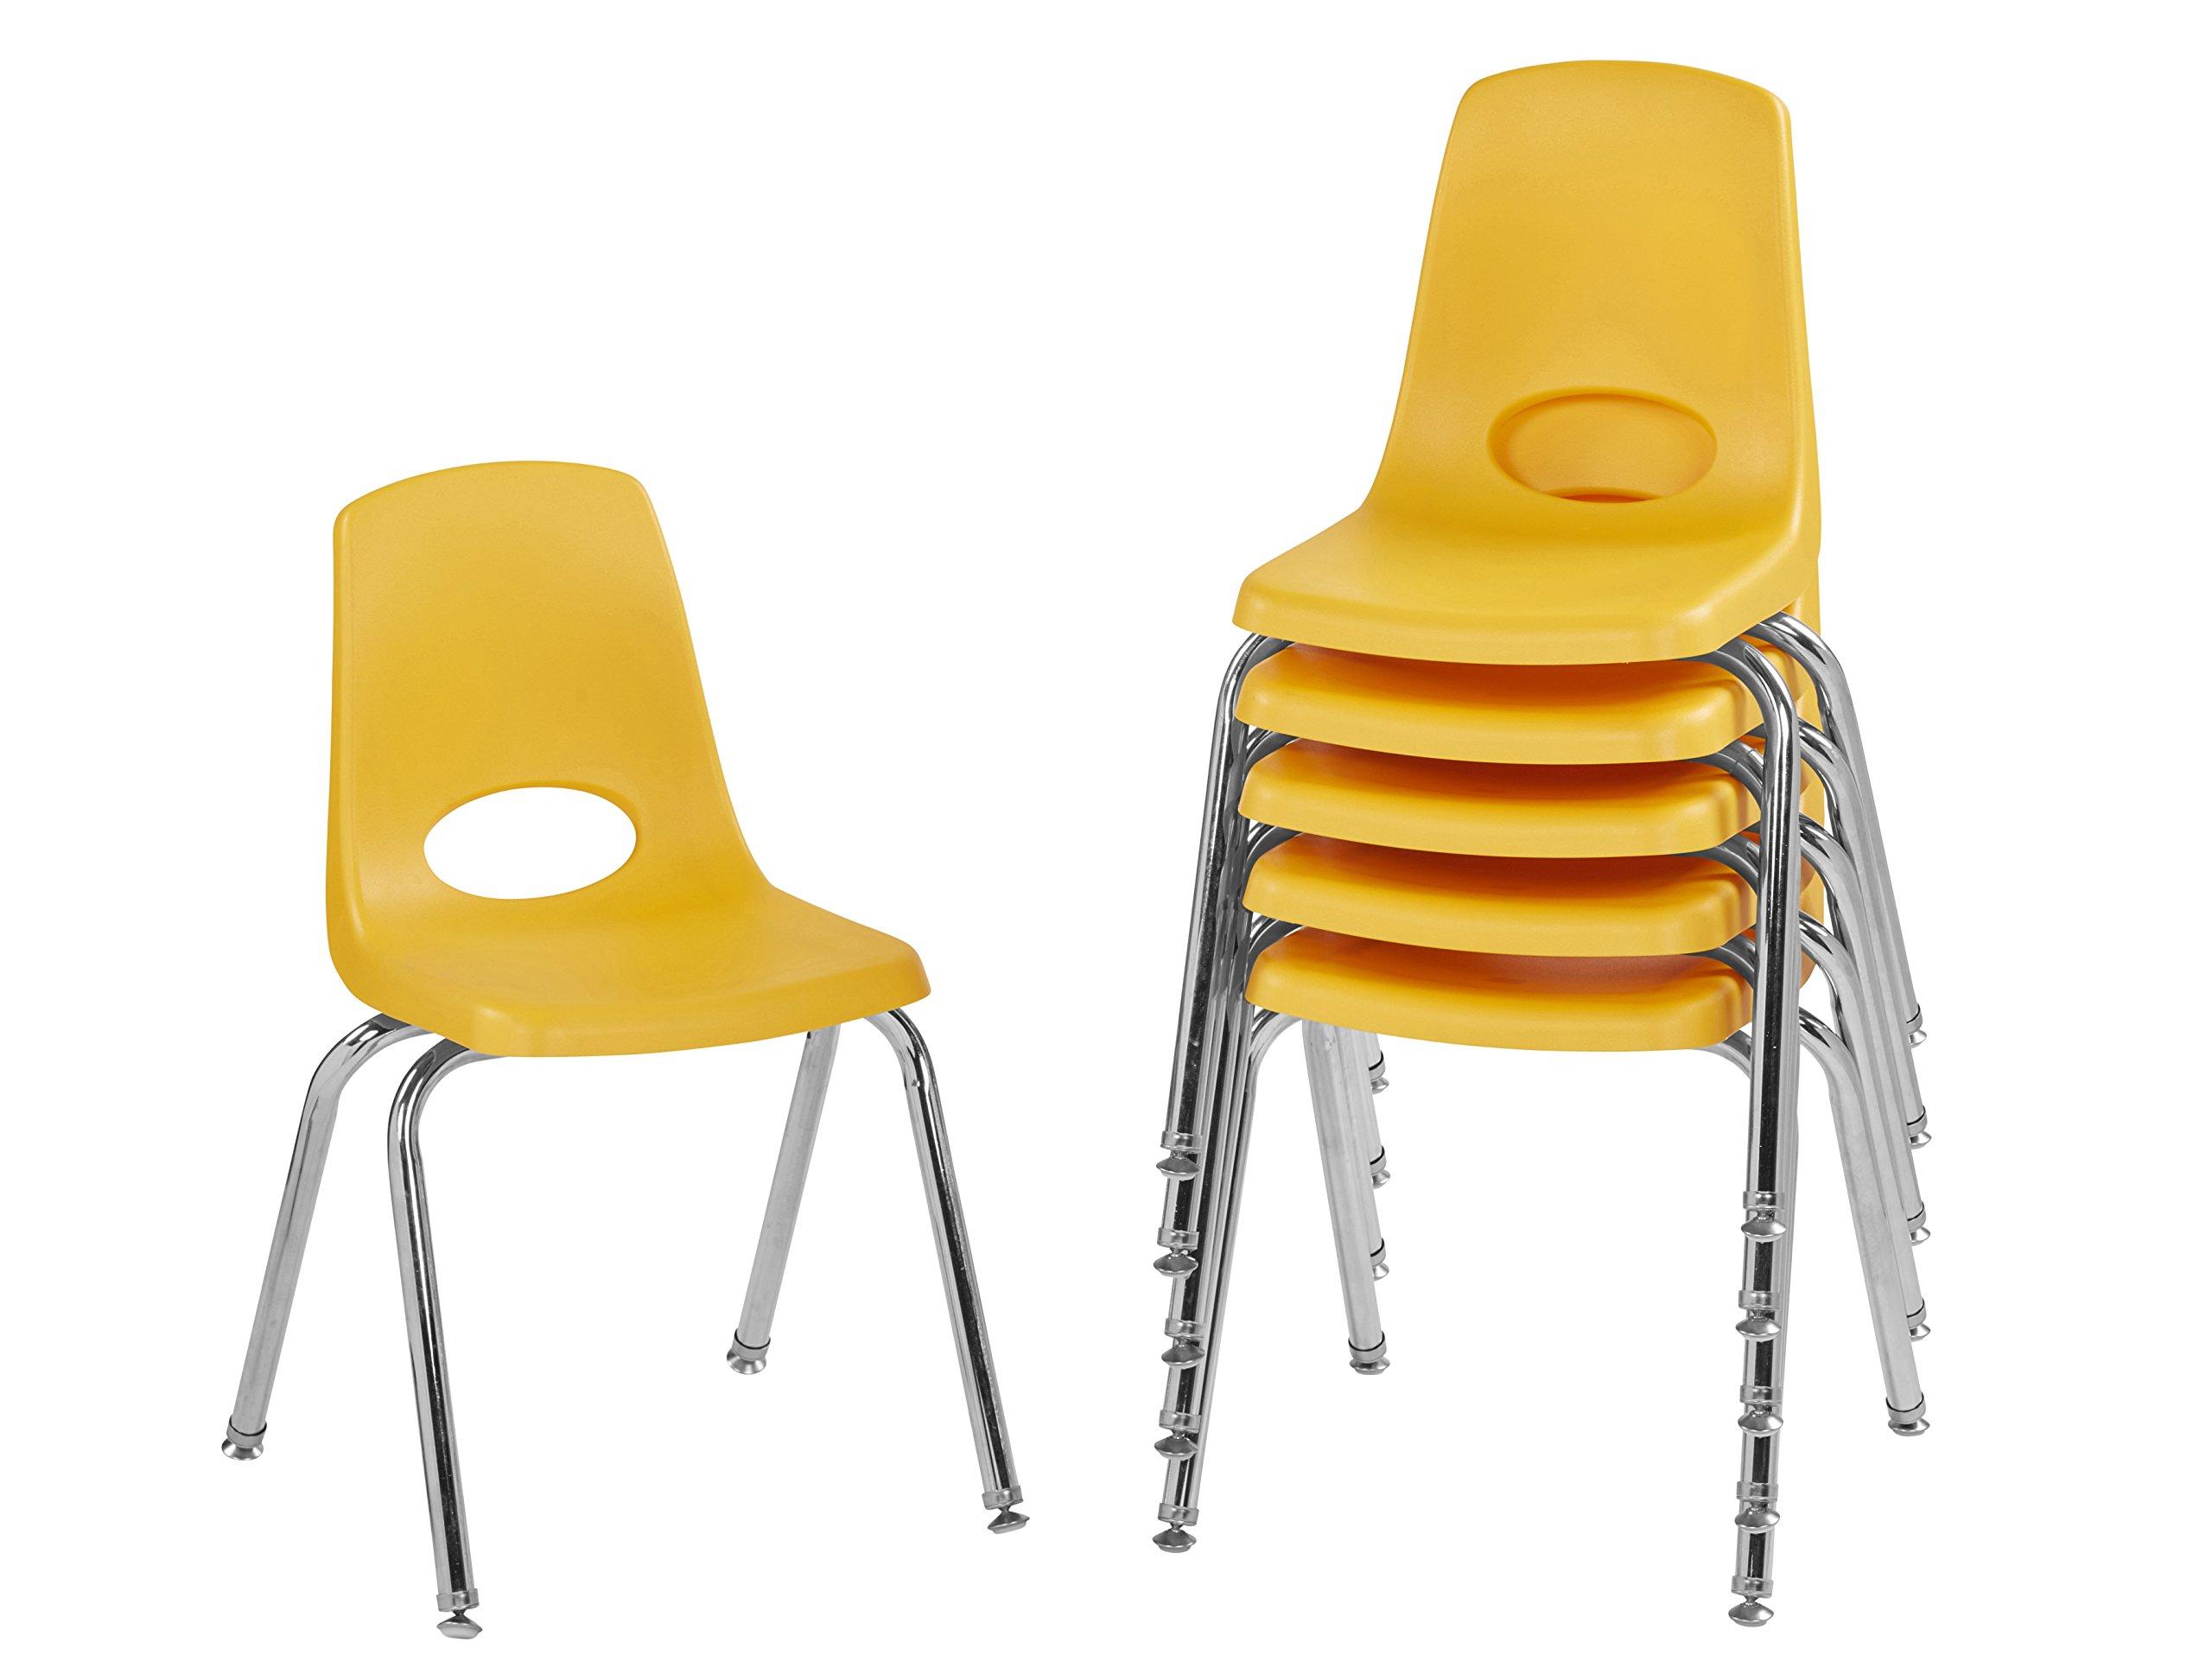 ECR4Kids 16'' School Stack Chair, Chrome Legs with Nylon Swivel Glides, Yellow (6-Pack)